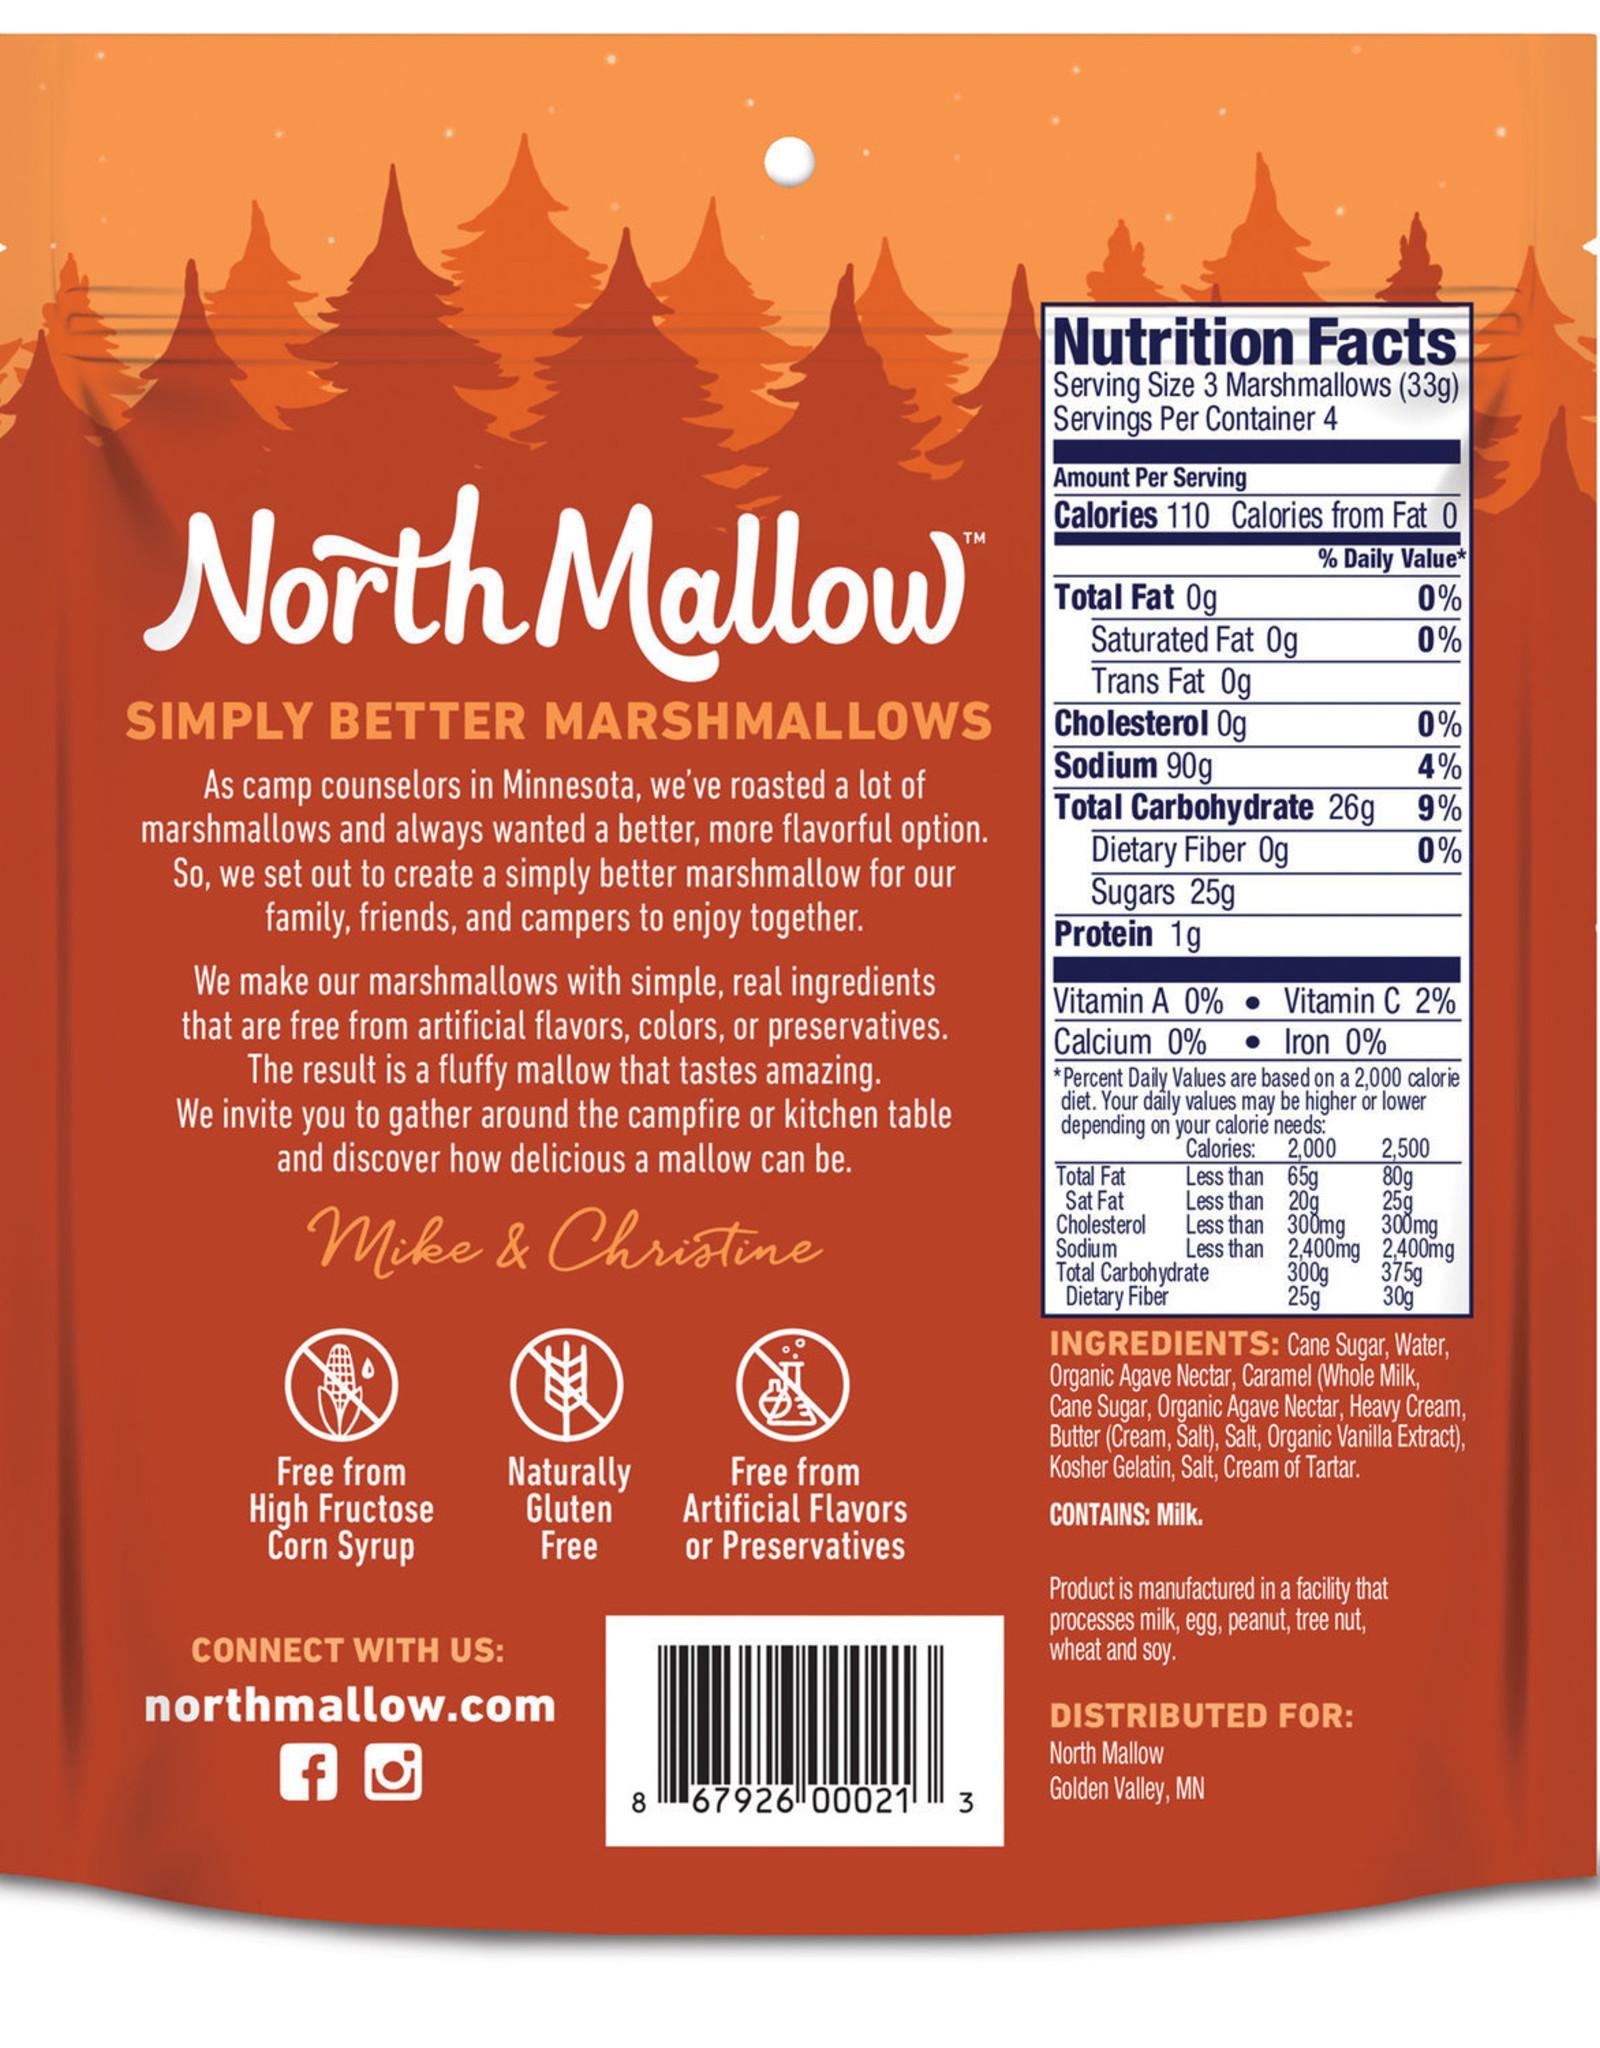 North Mallow North Mallow Caramel Swirl